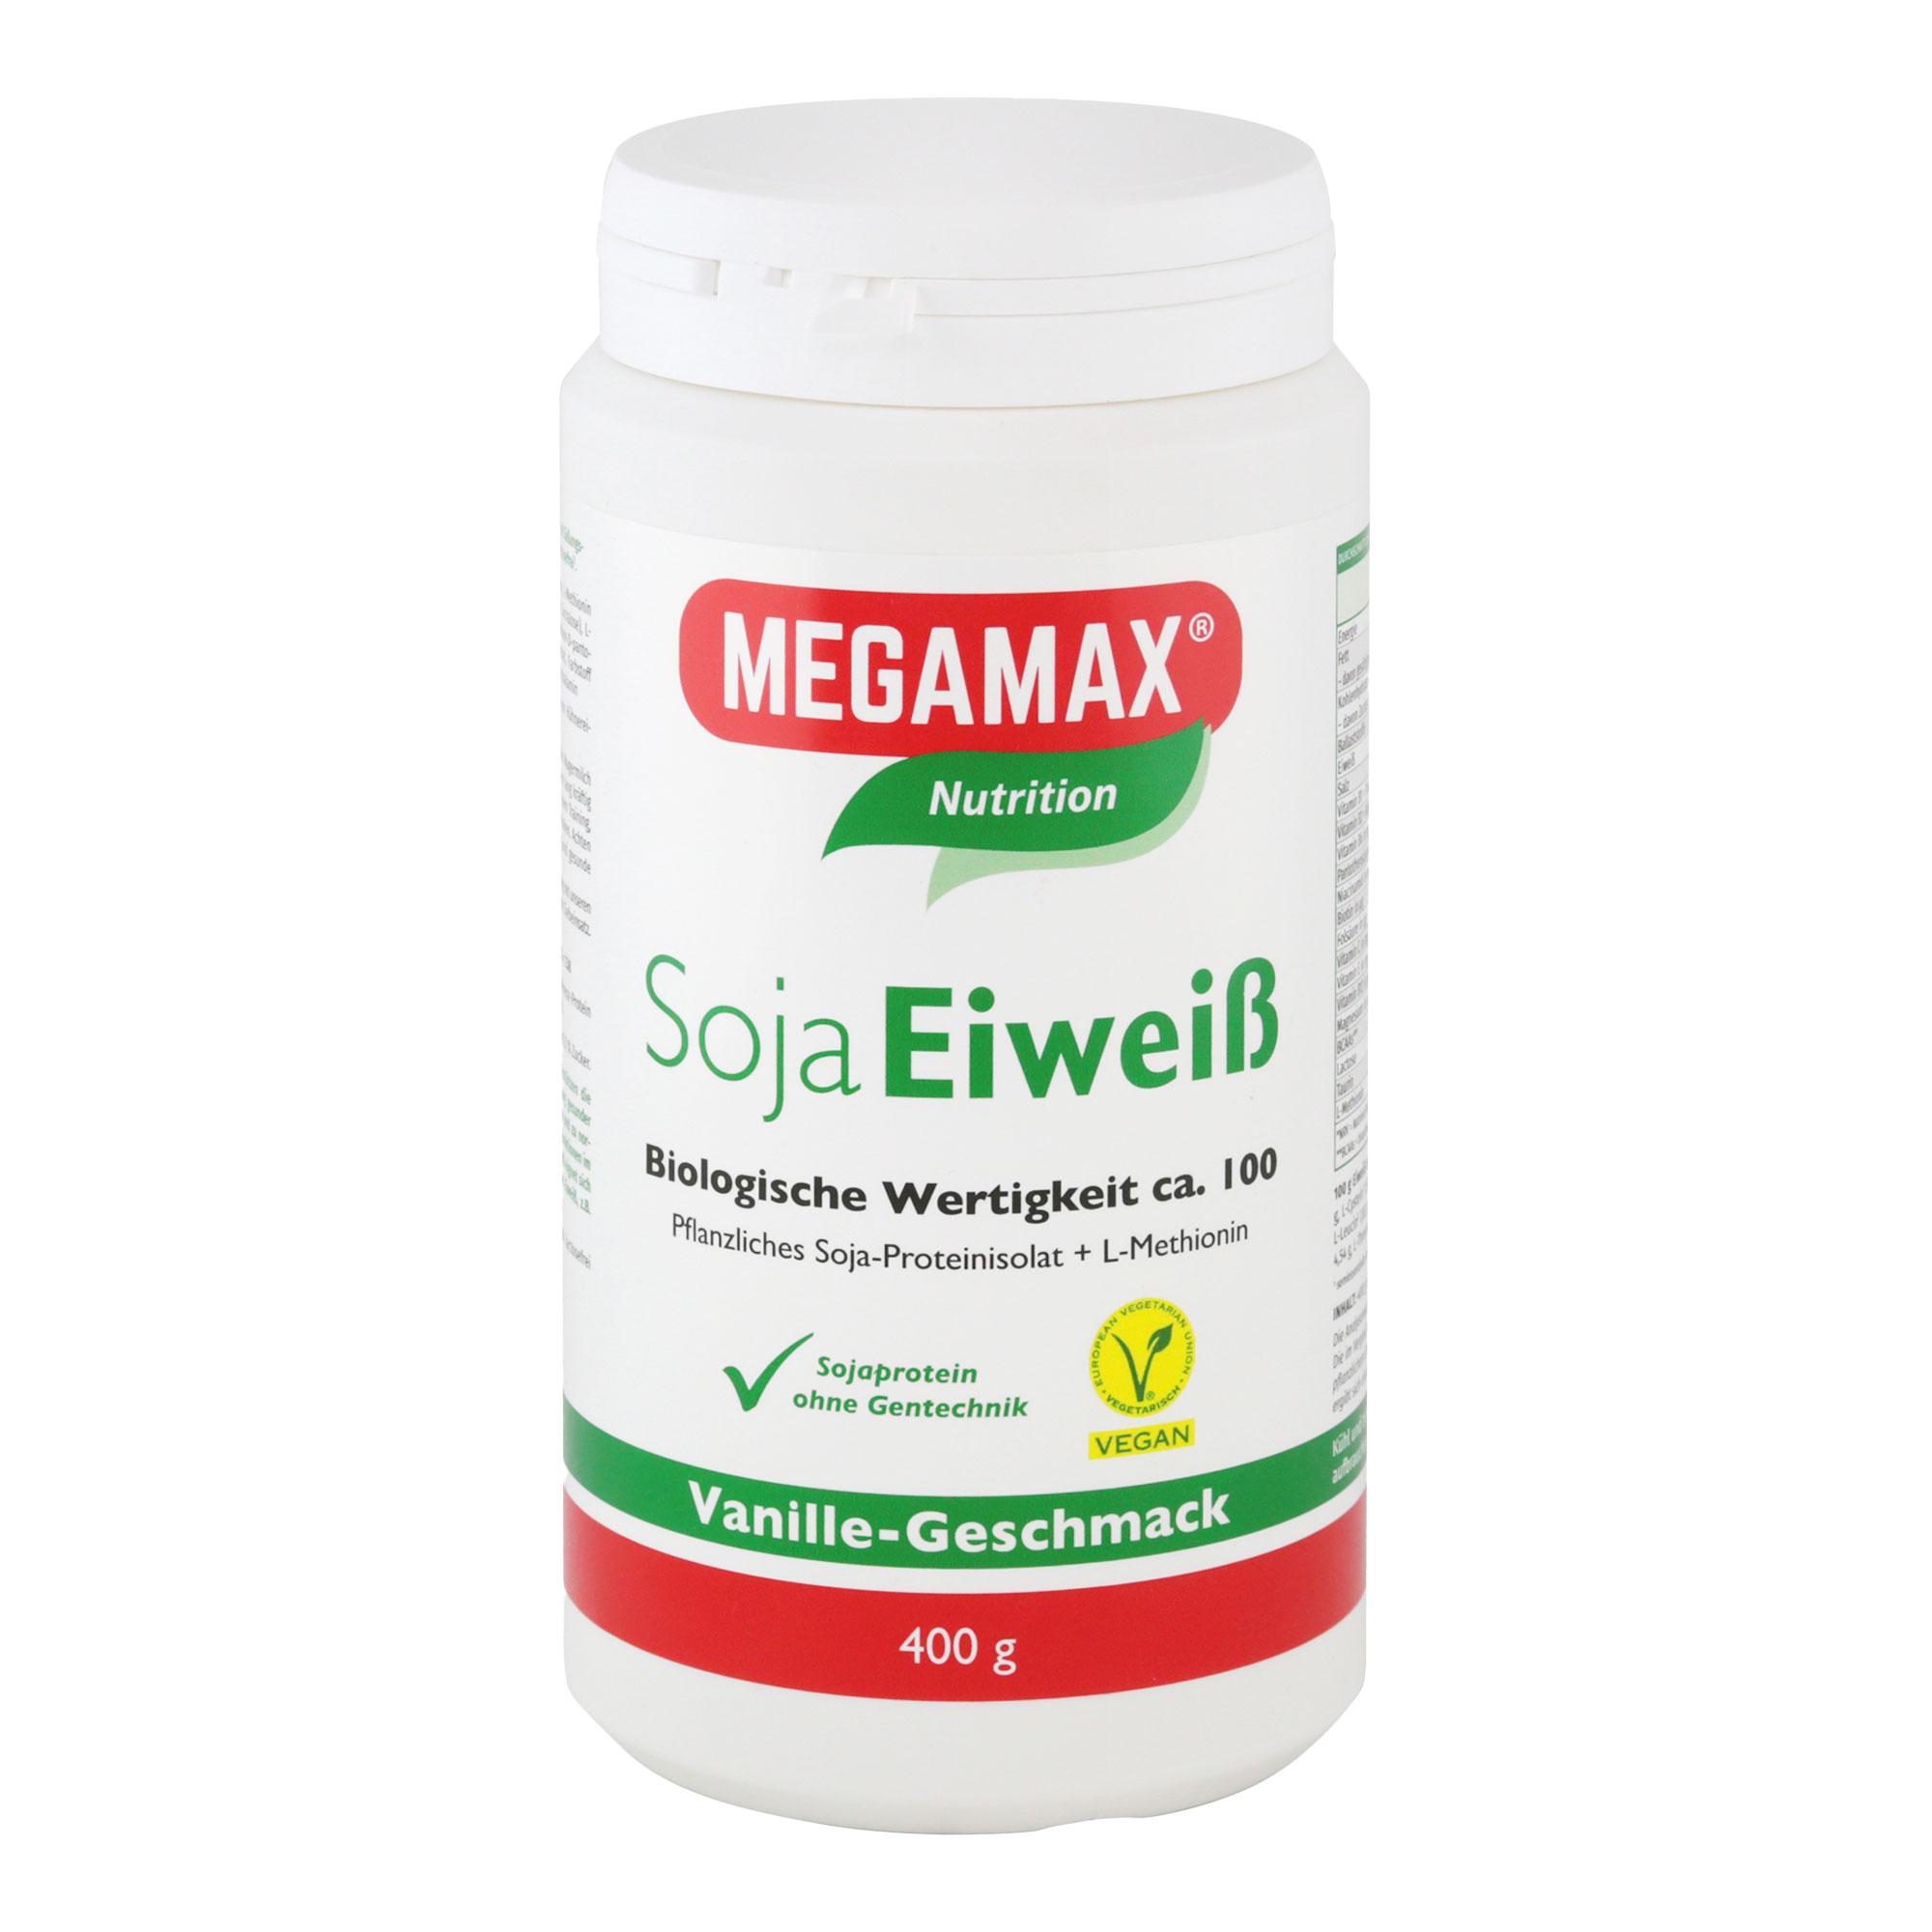 MegaMax Soja Eiweiß Vanille